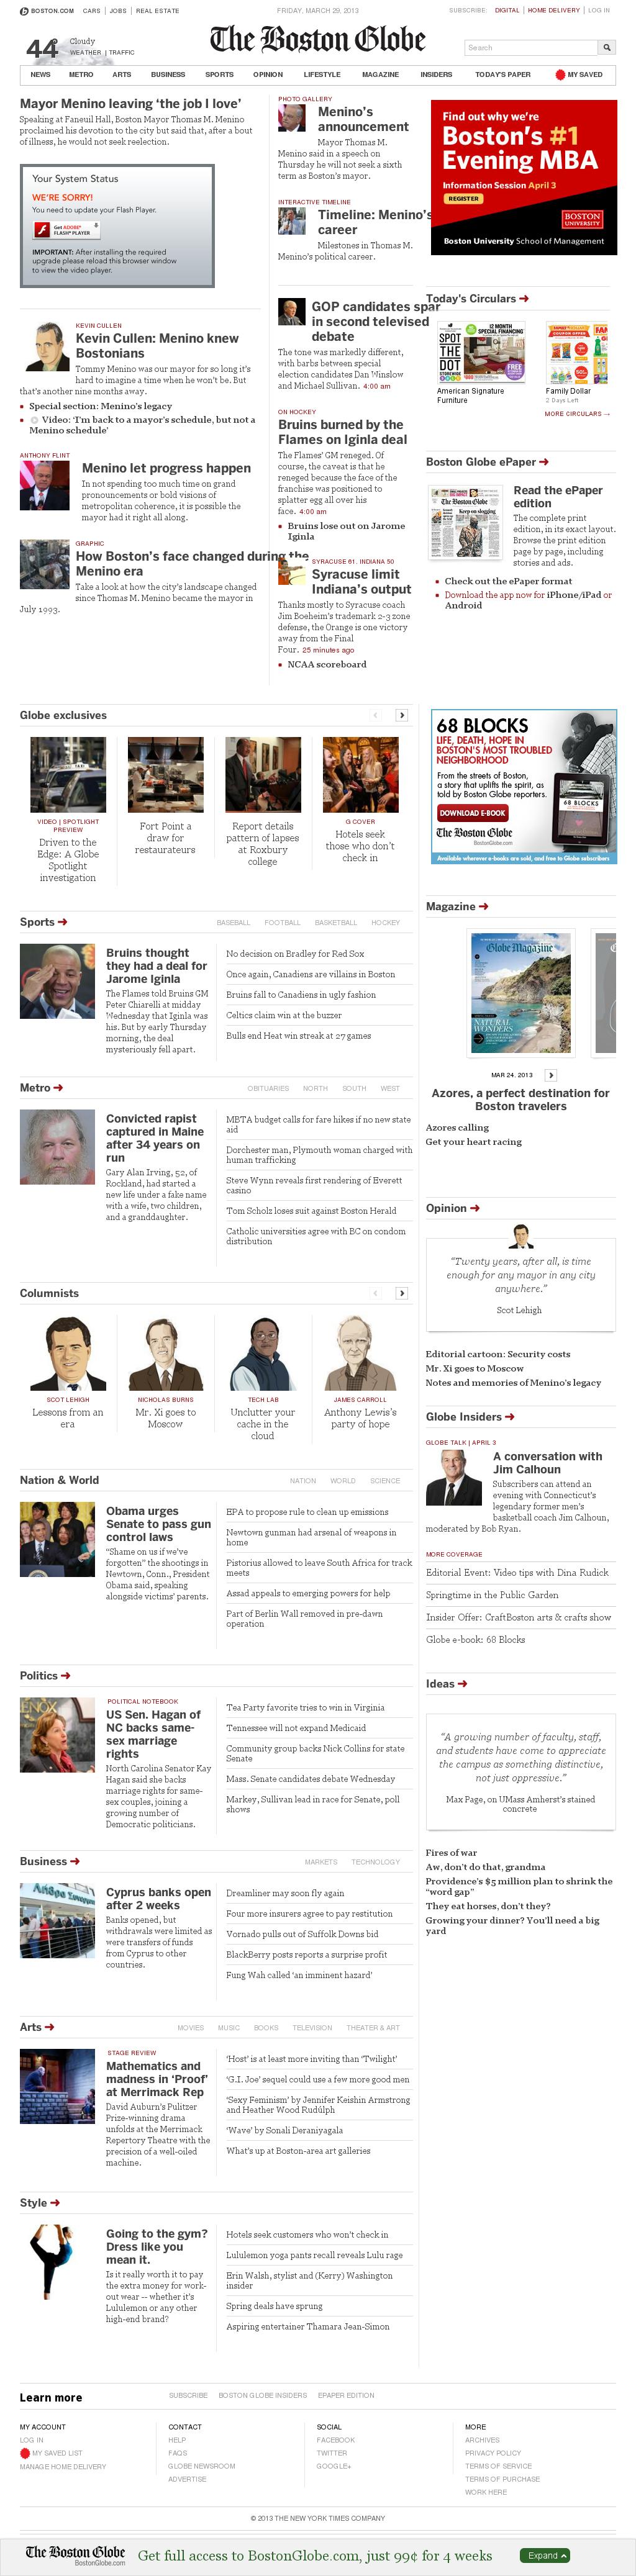 The Boston Globe at Friday March 29, 2013, 5:02 a.m. UTC